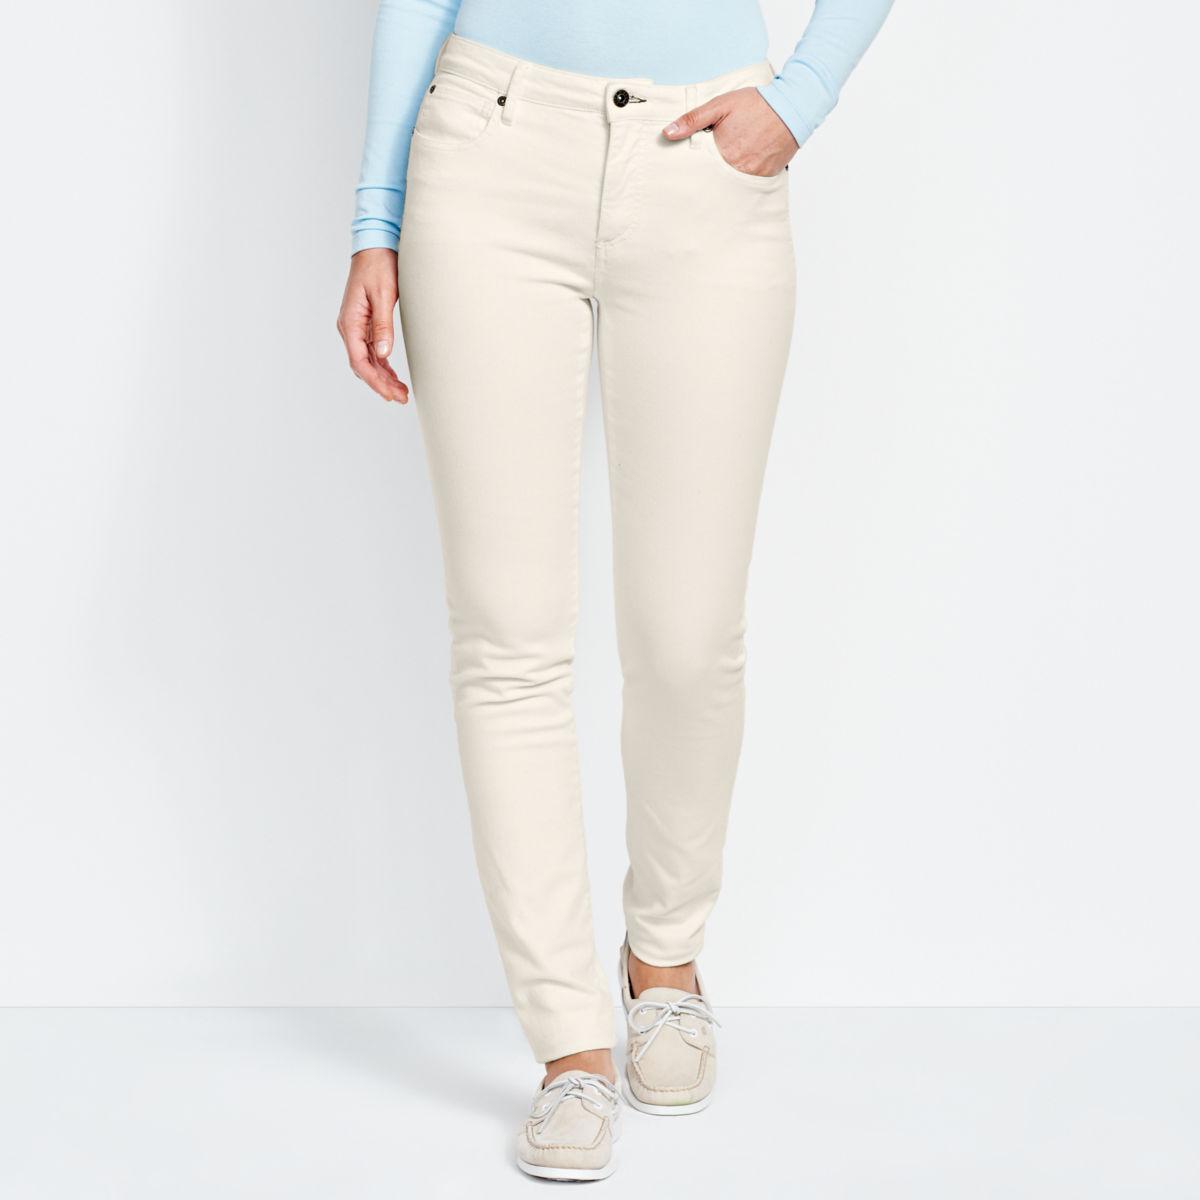 1856 Stretch Denim Skinny Jeans - WHITEimage number 0